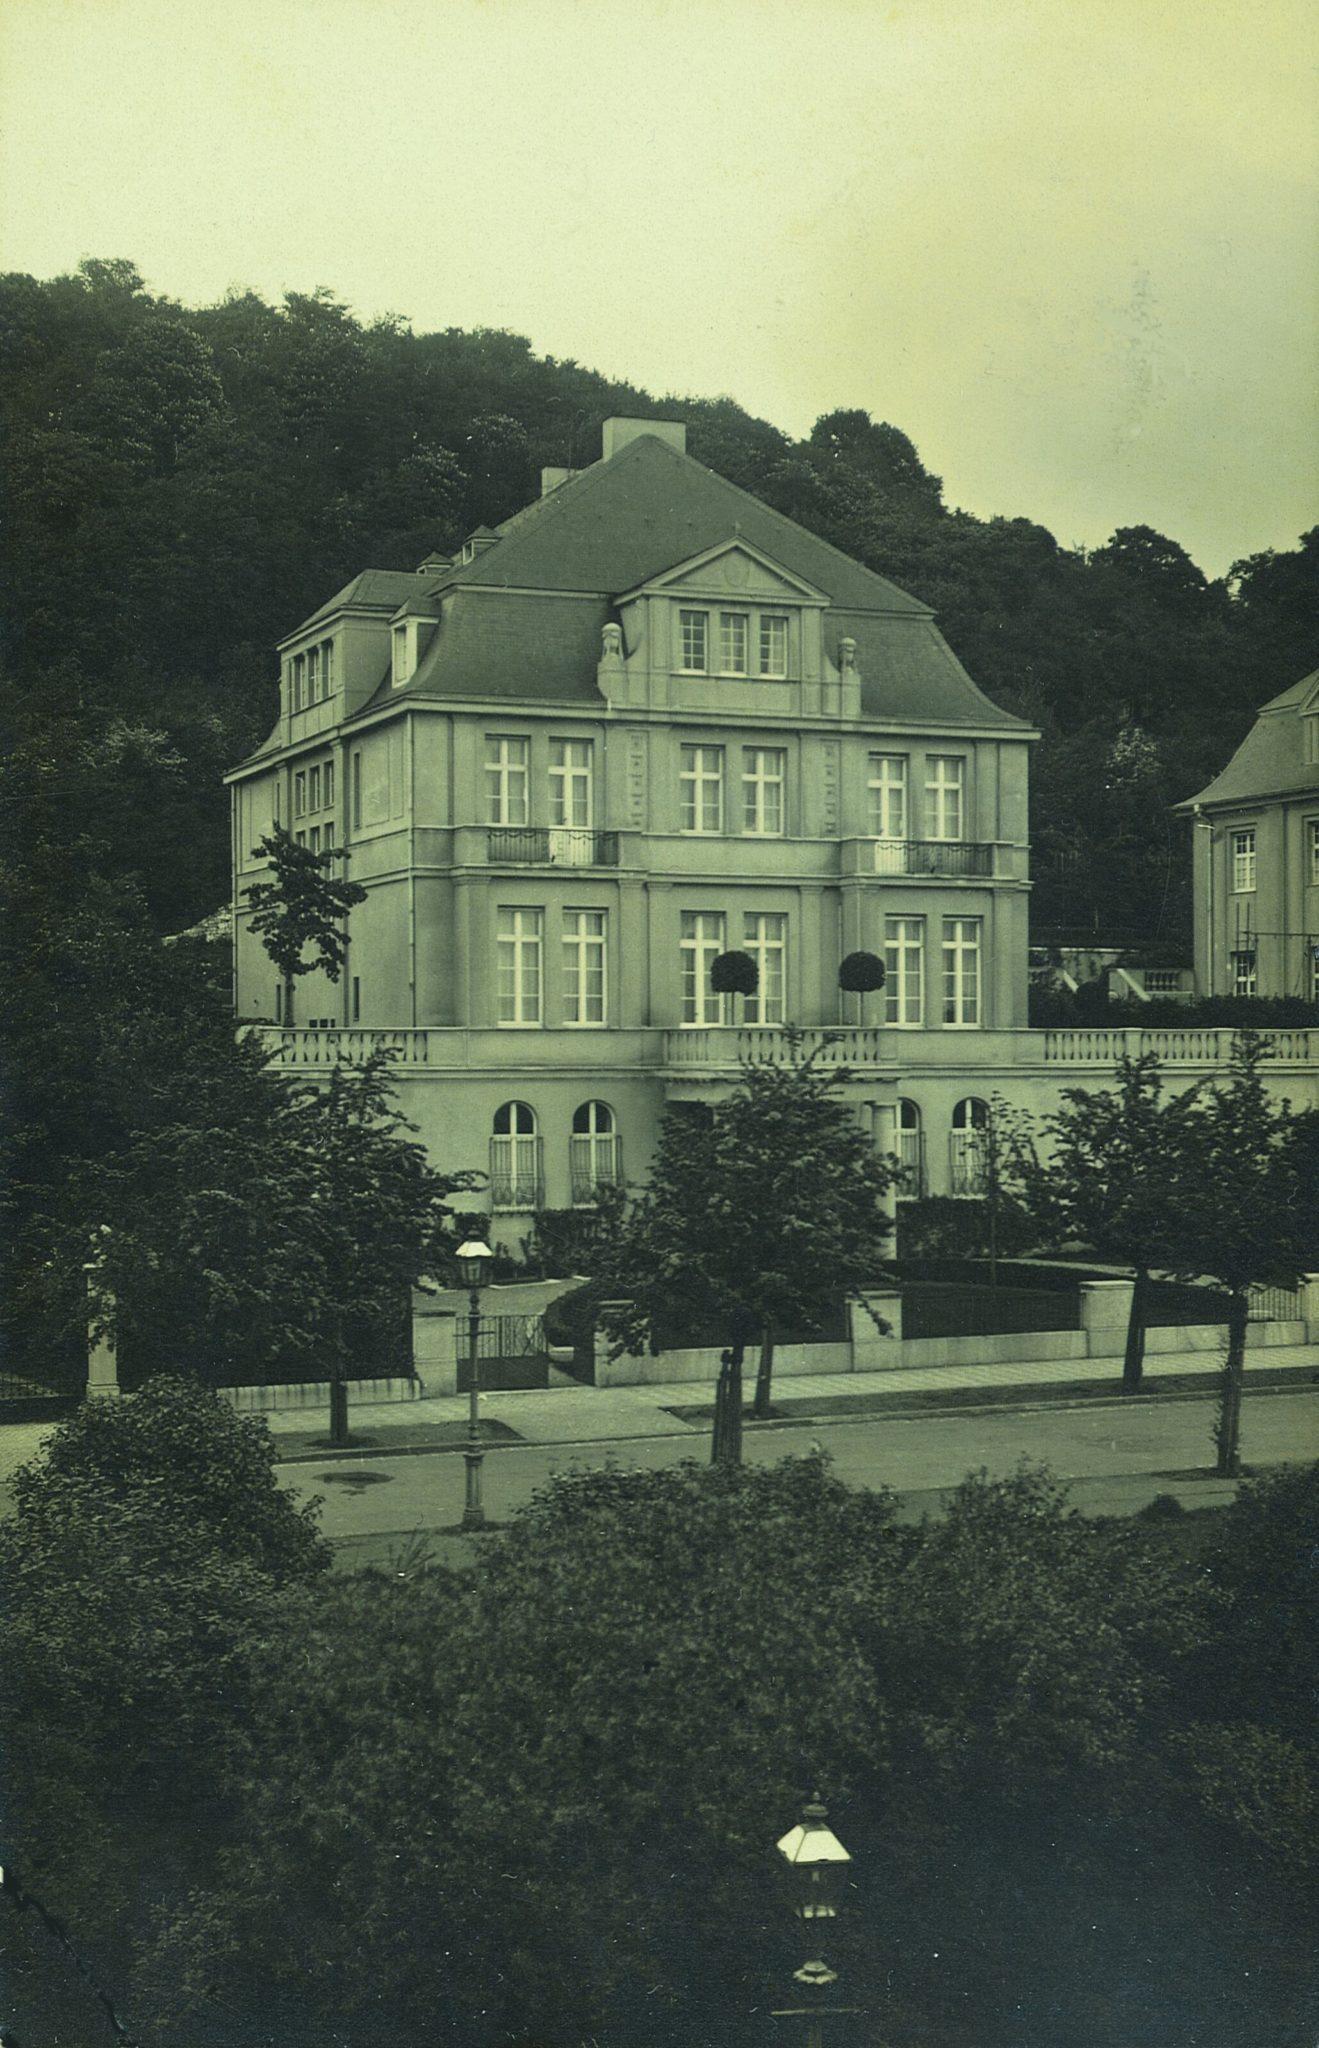 Ansichtskarte vor 1920. Fotograf unbekannt.